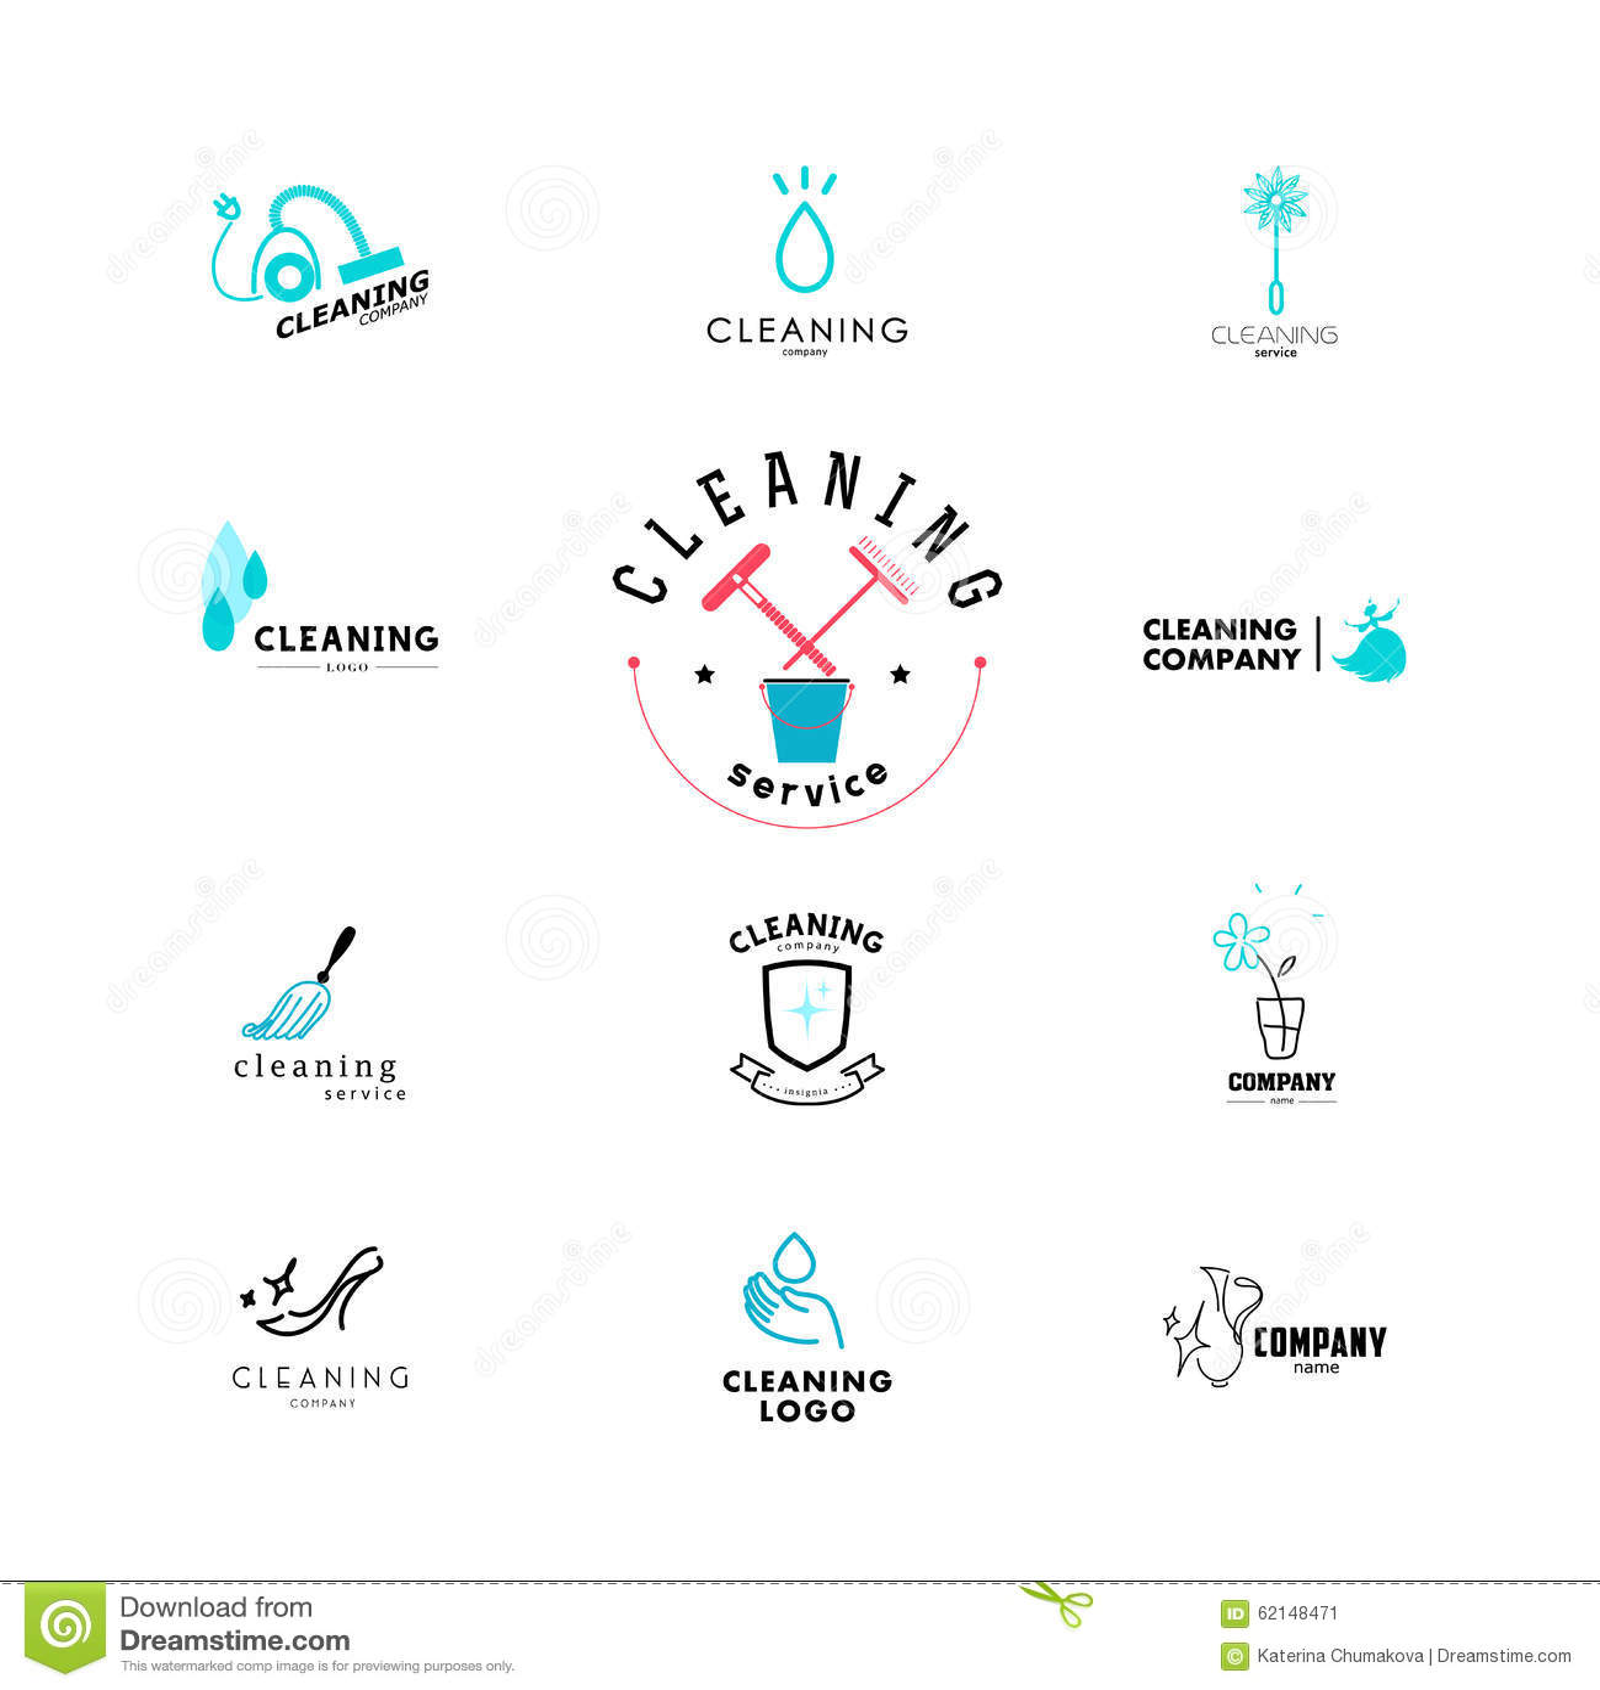 Wiring Company Logos